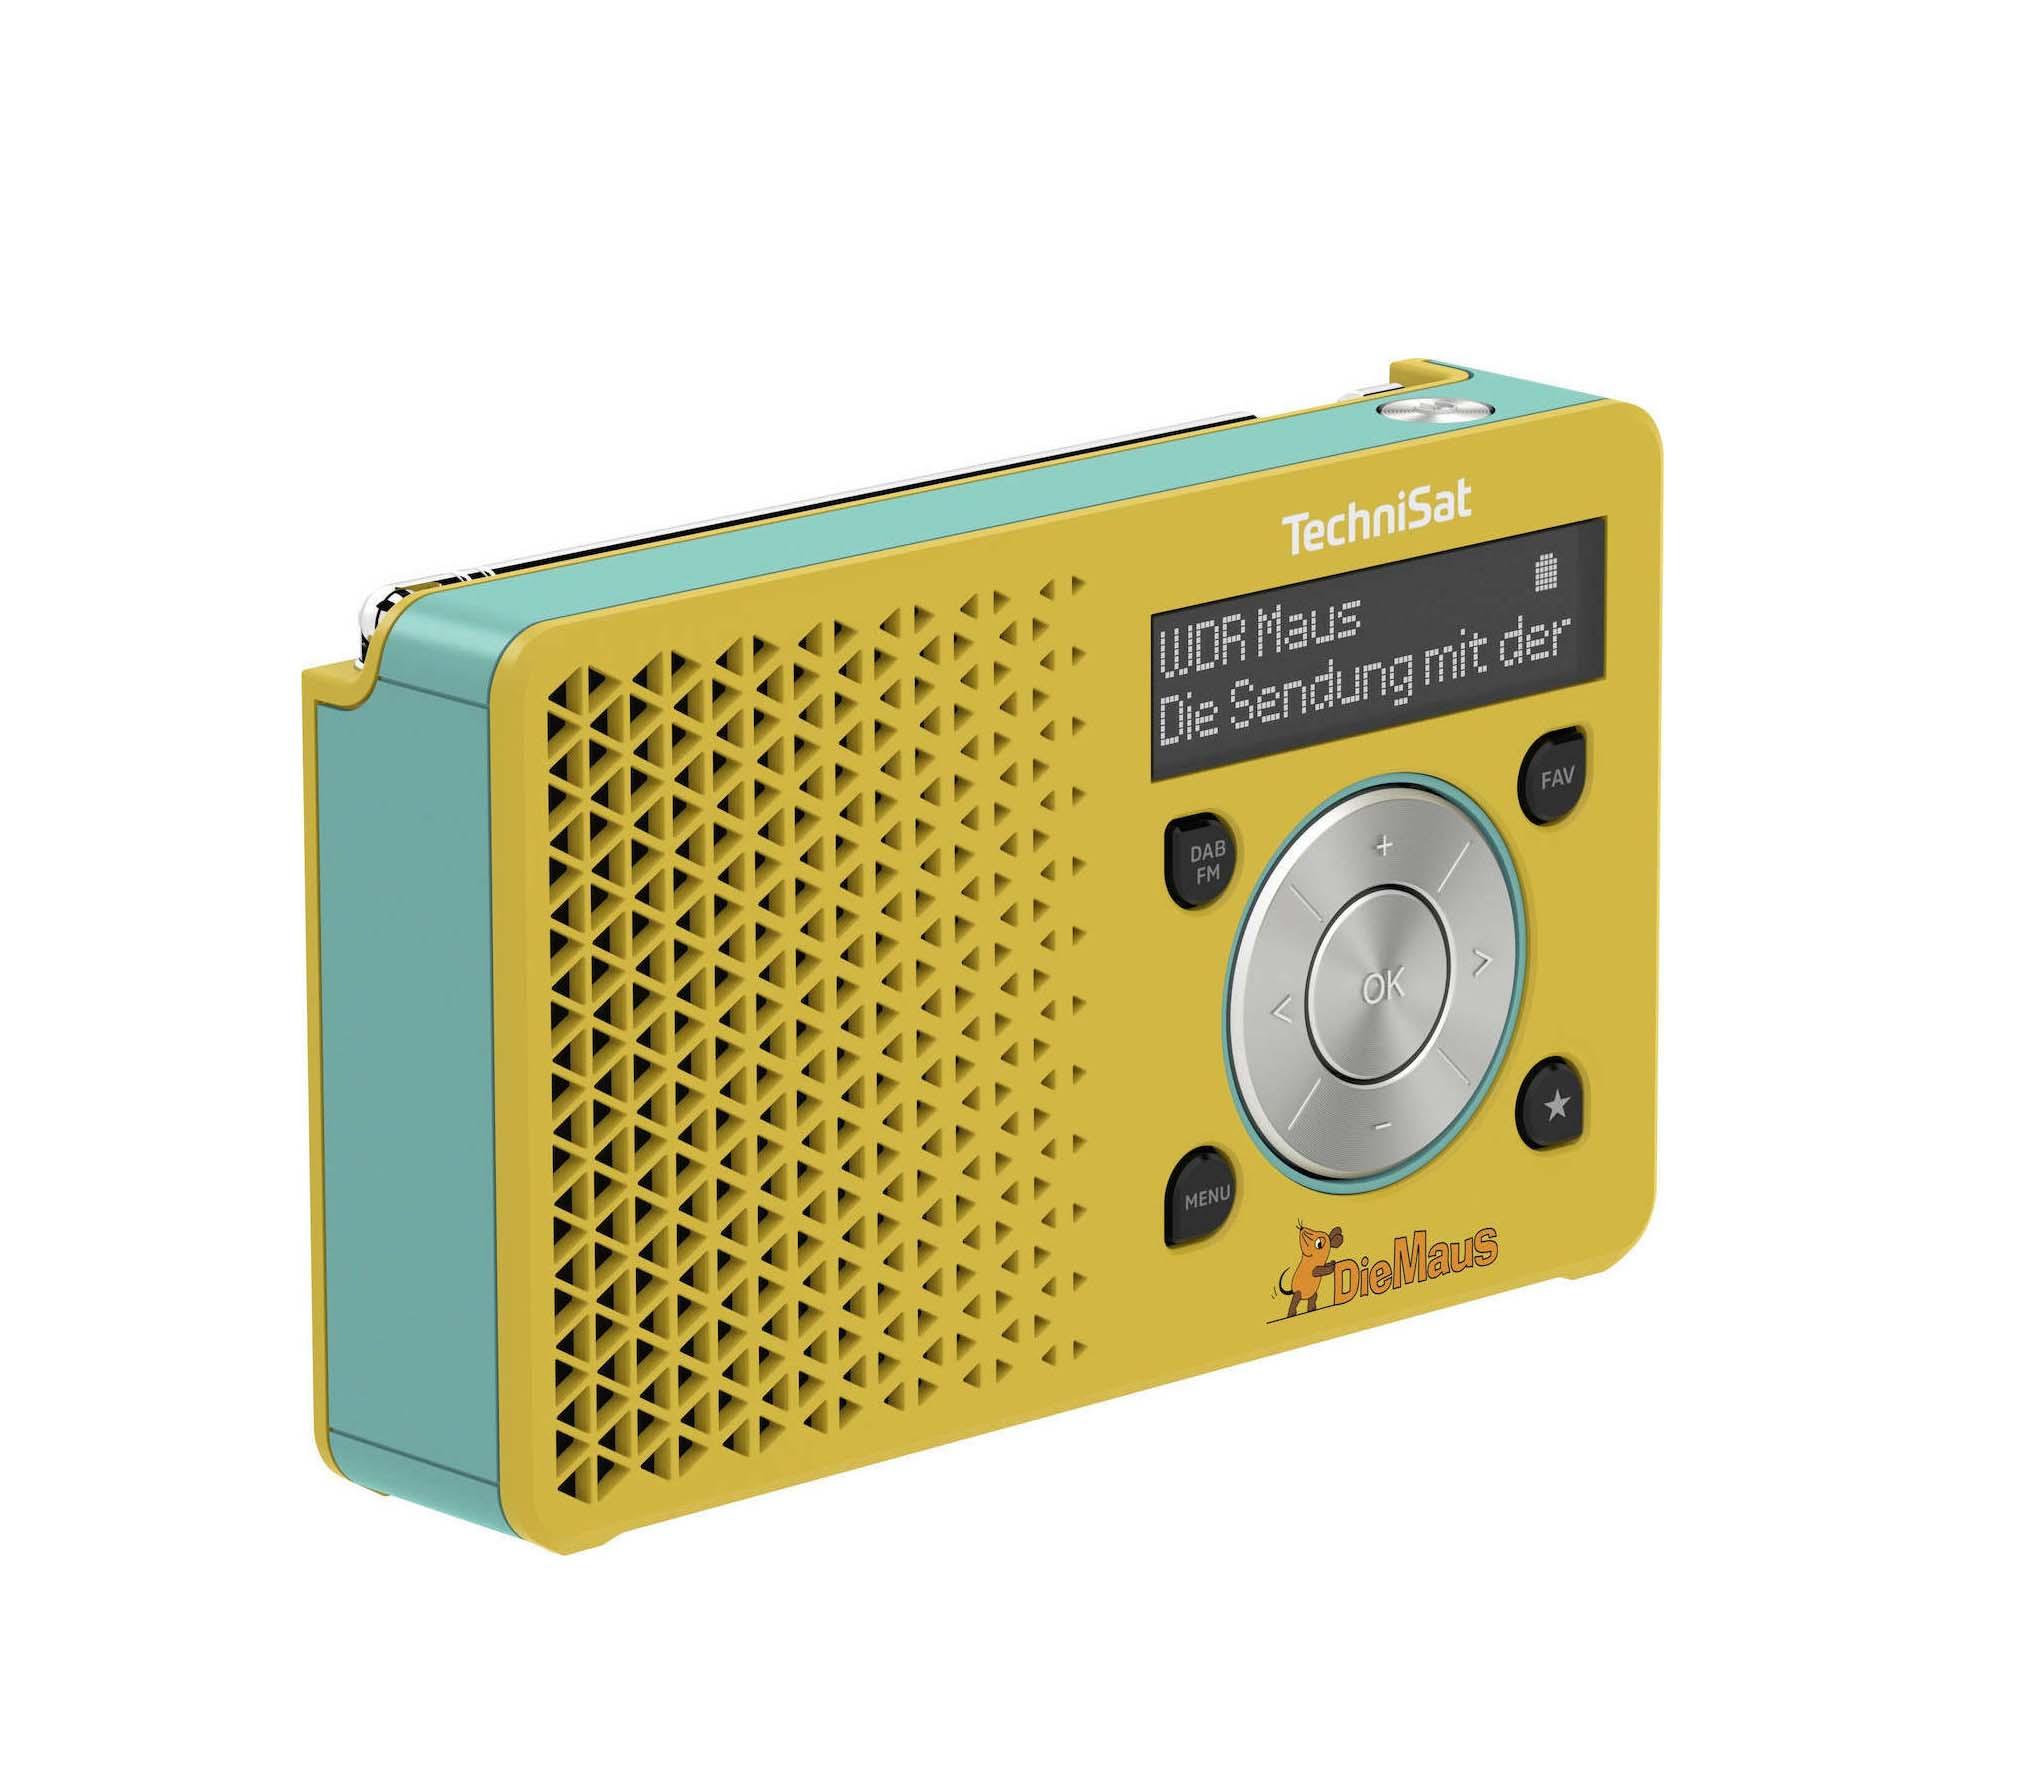 Technisat Digitradio 1 Mouse Edition Ραδιόφωνο 0039/4997